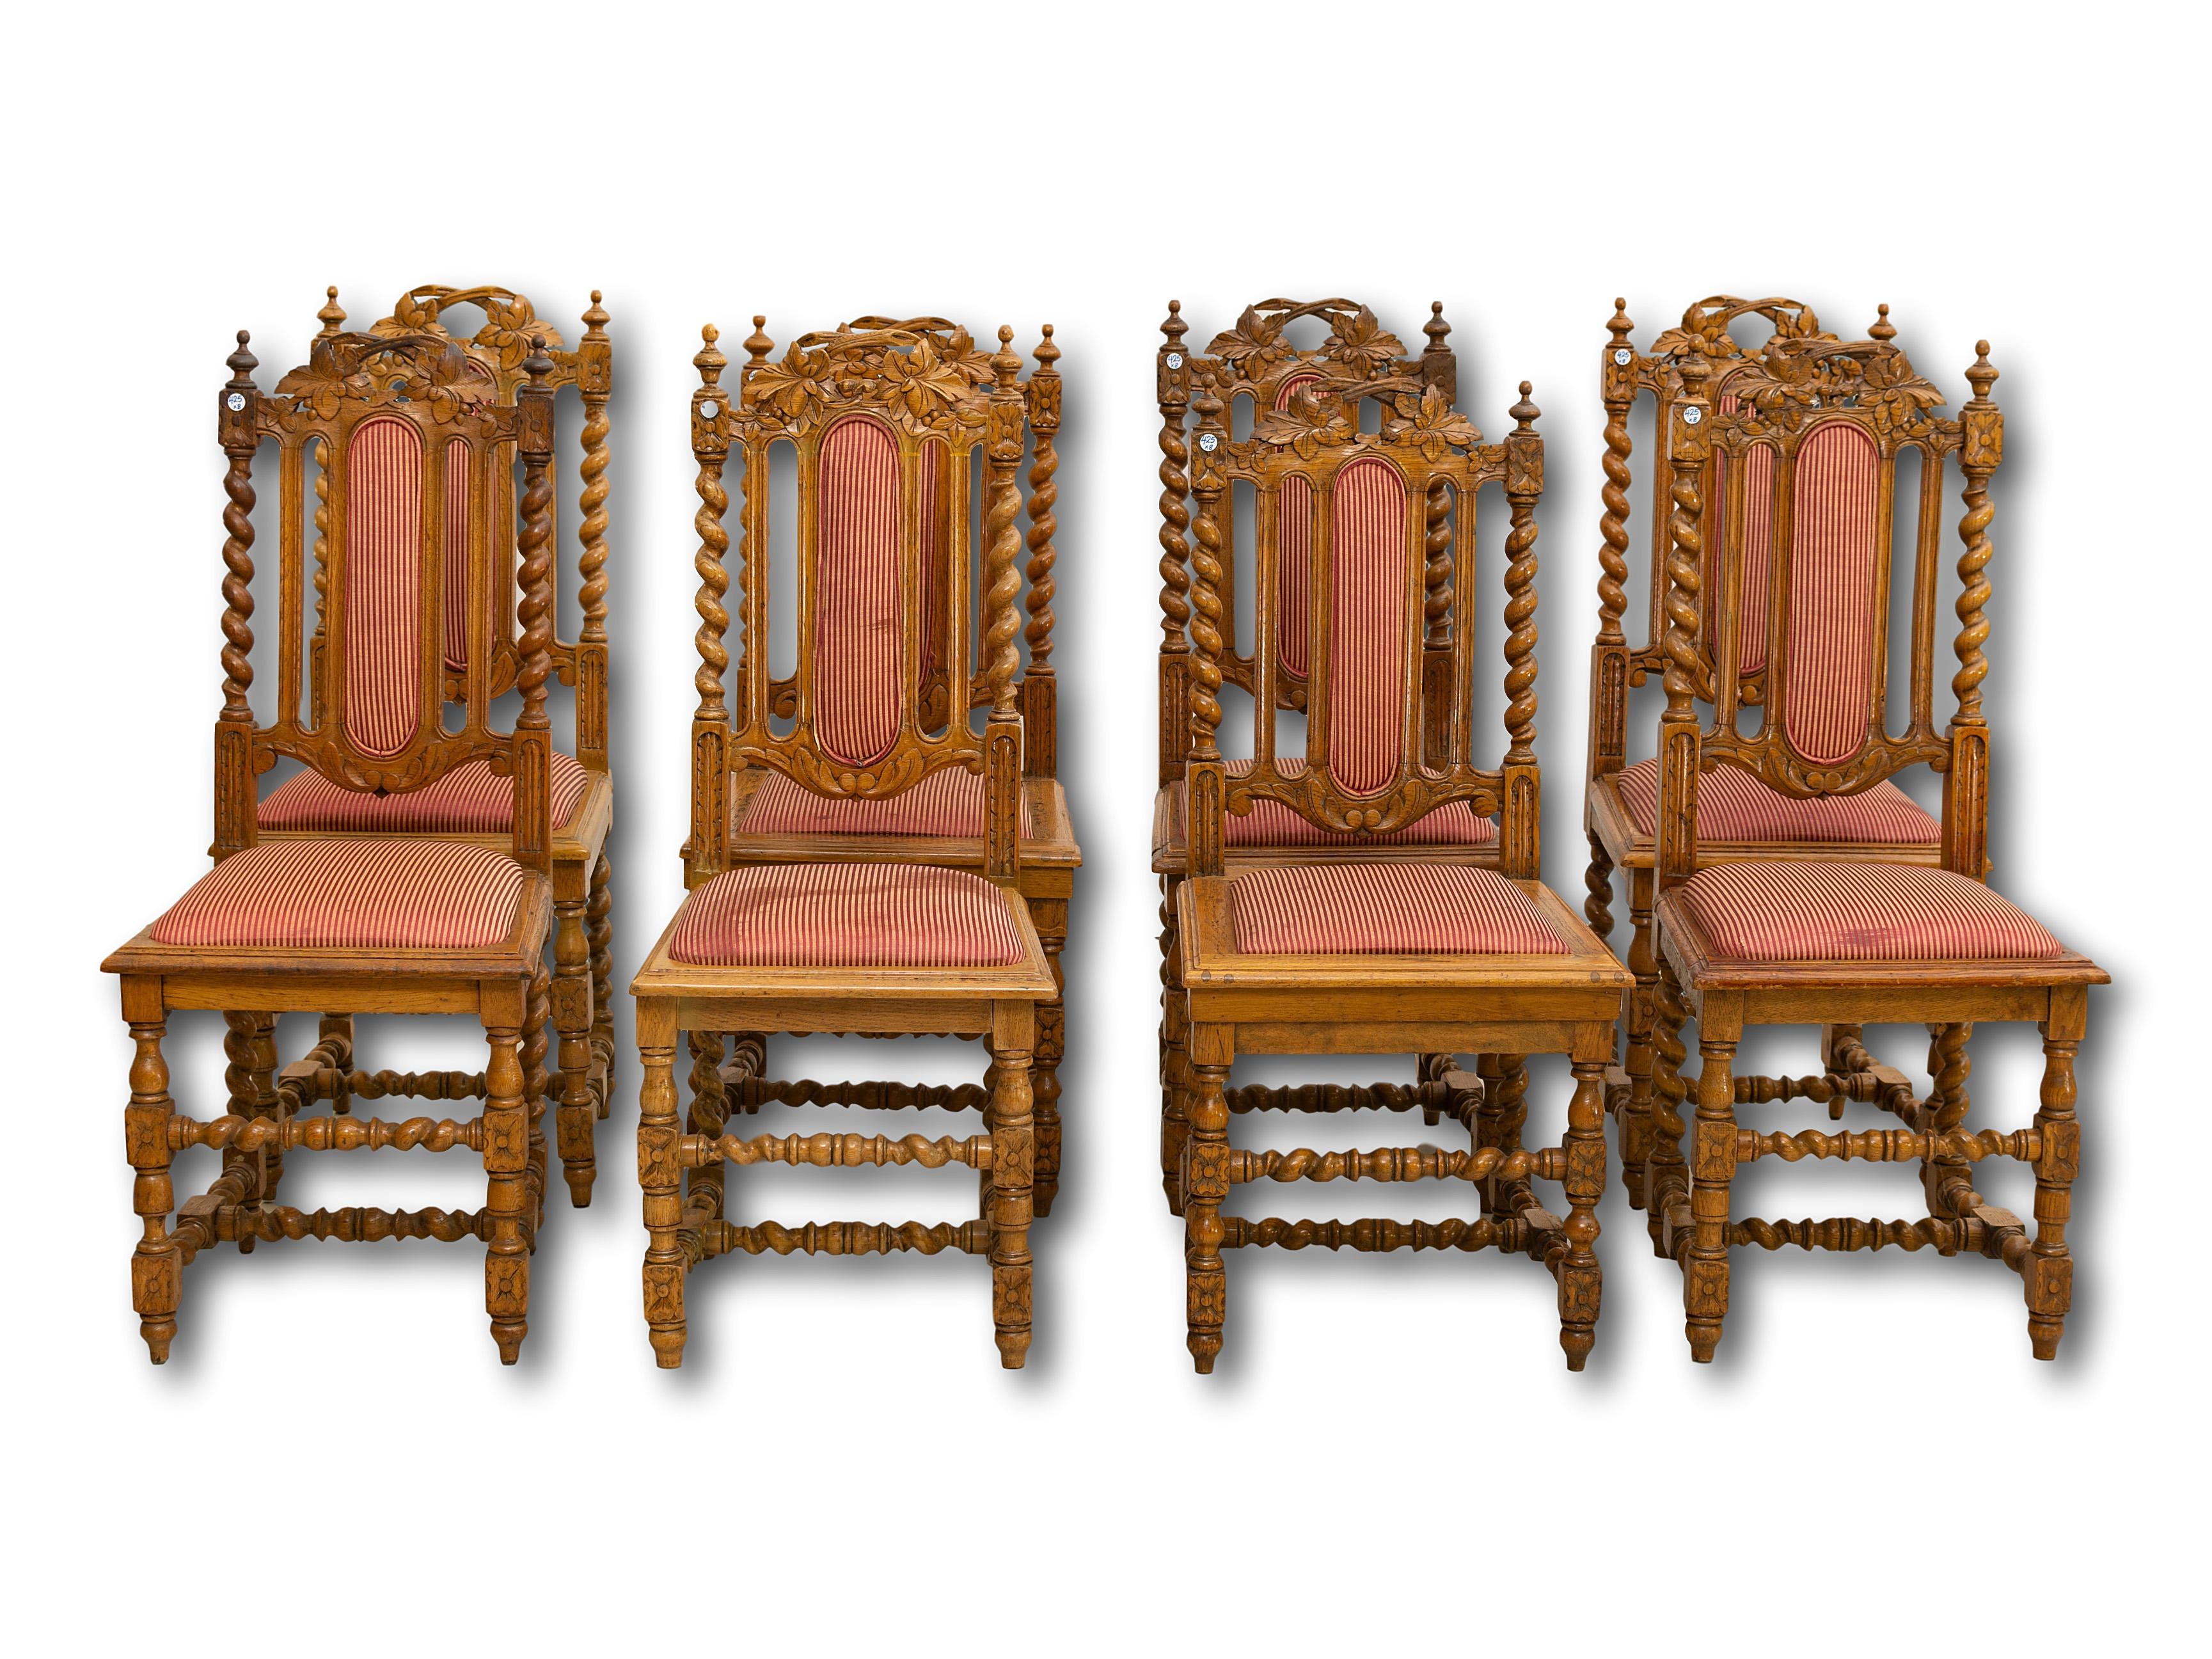 A Set of 8 Continental Oak Barley-Twist Dining Chairs, 98 x 46 x 44